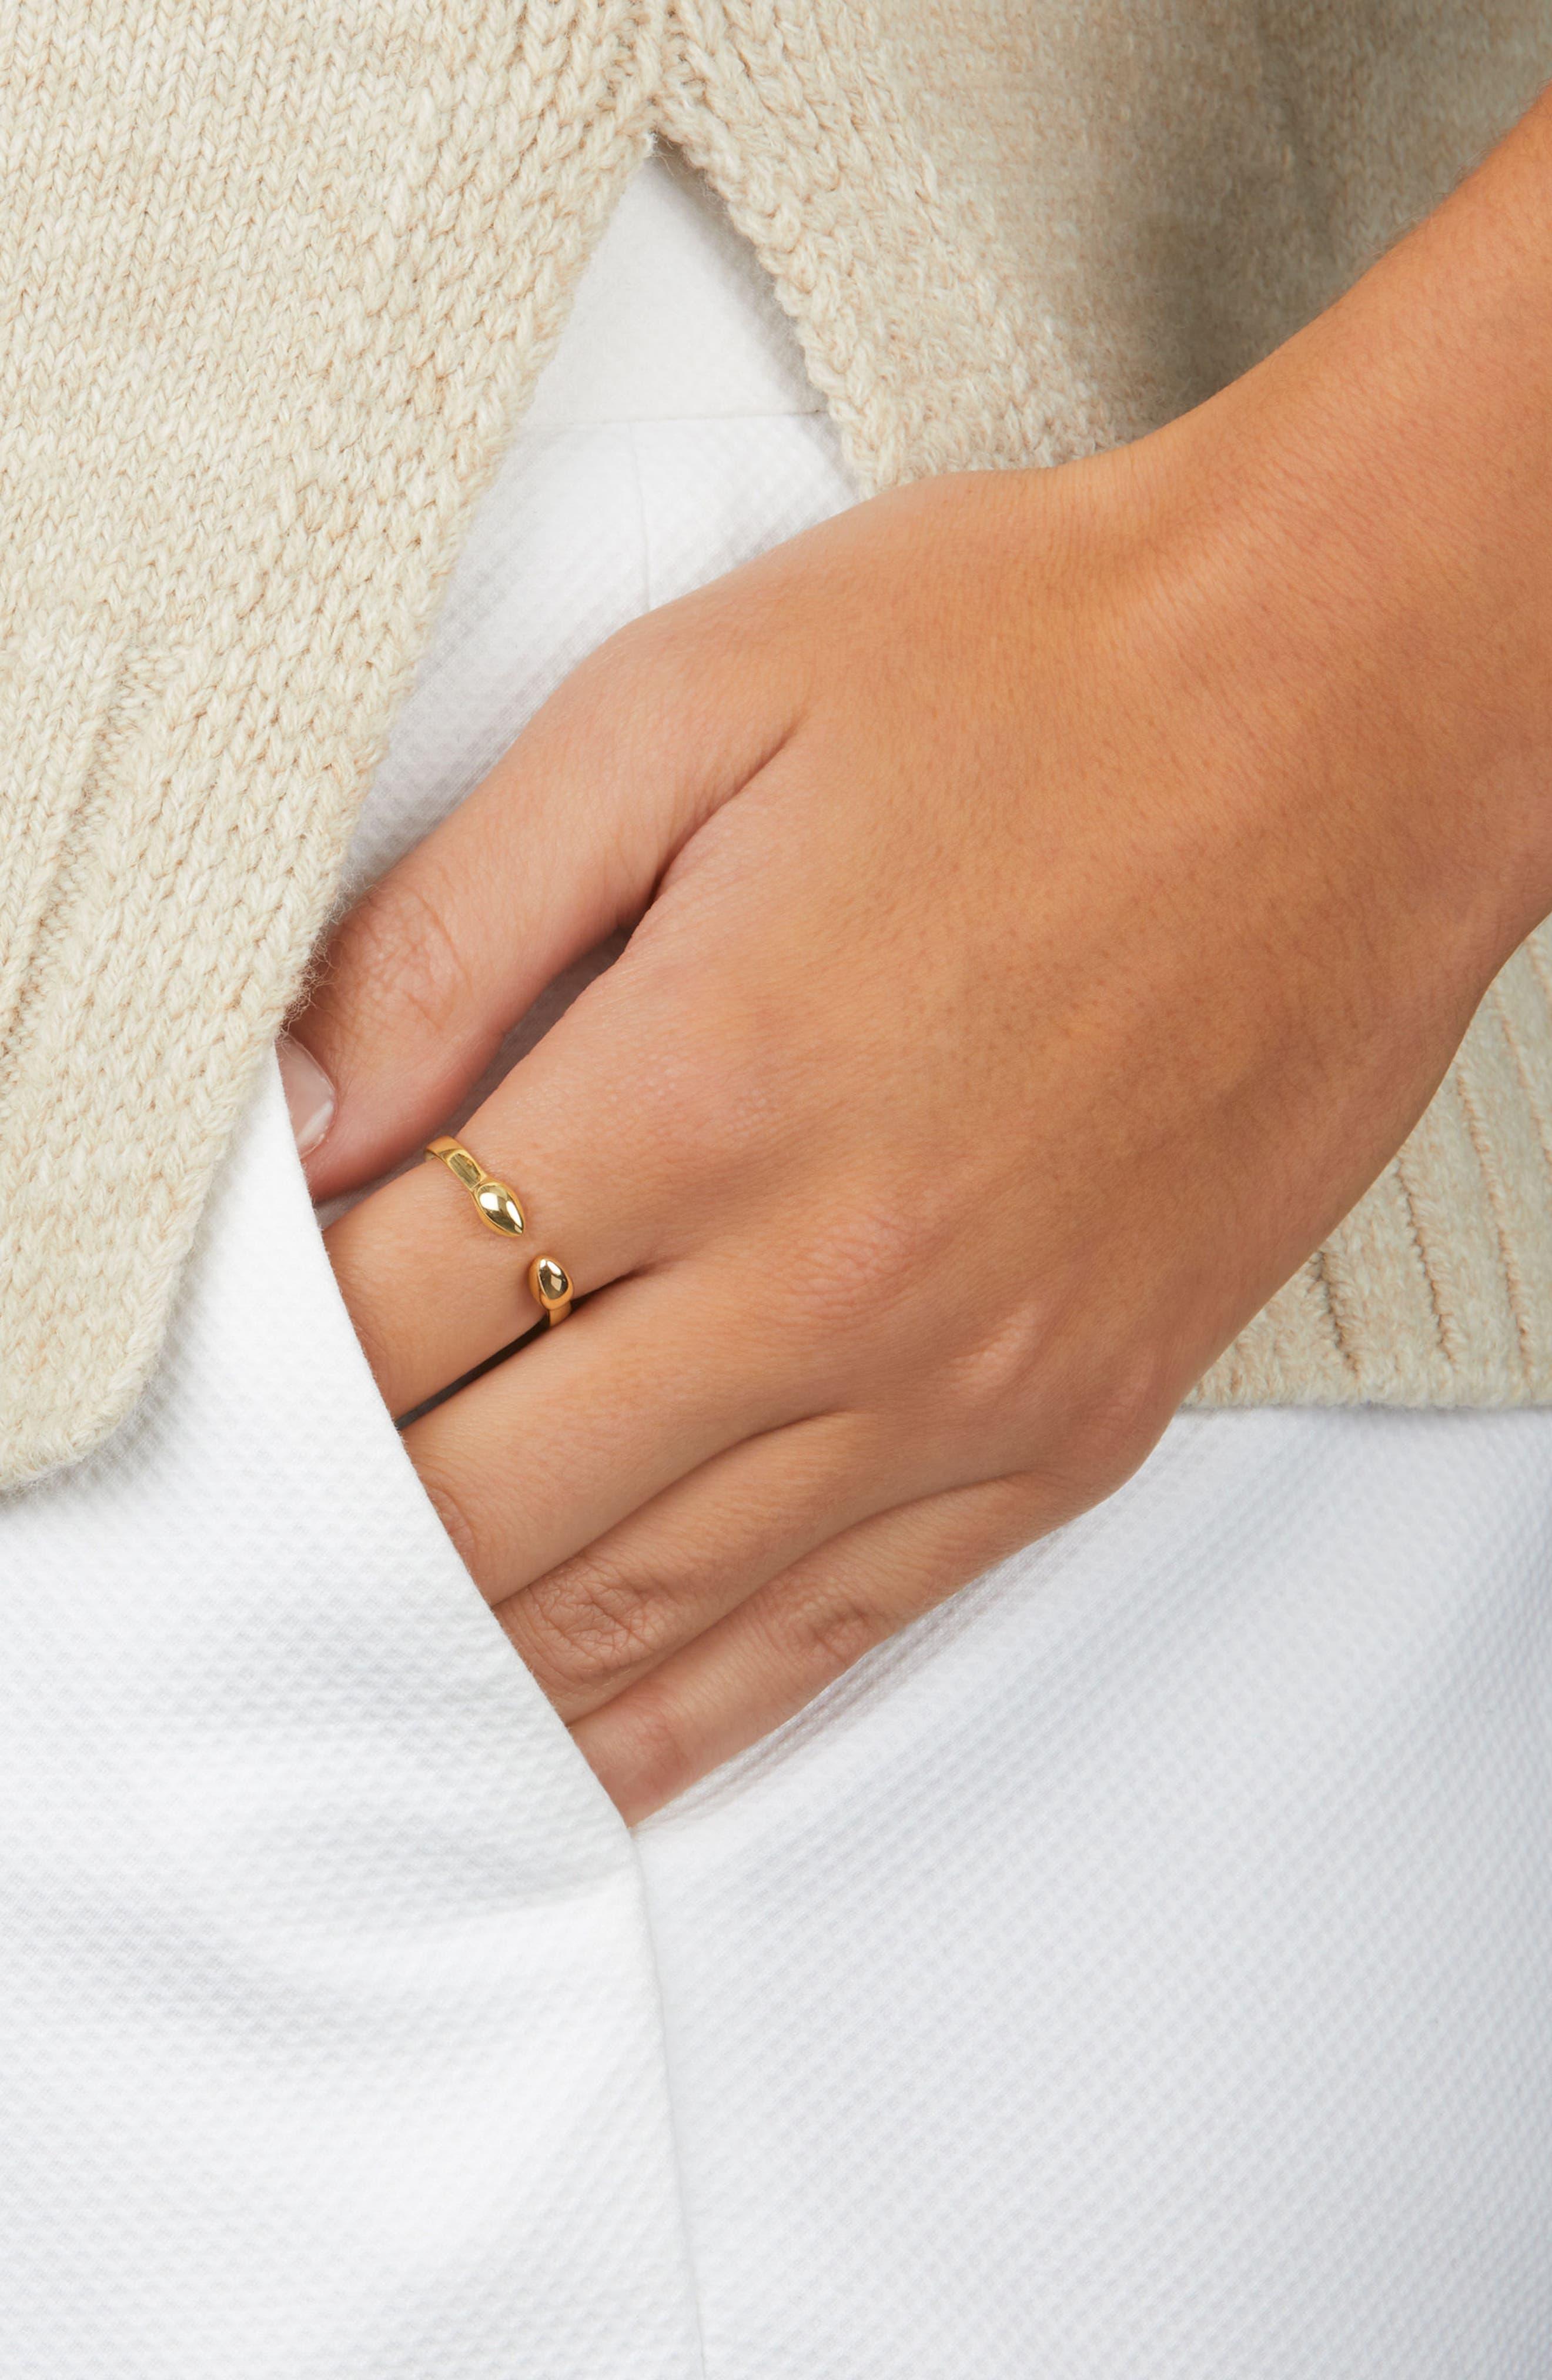 Fiji Bud Ring,                             Alternate thumbnail 2, color,                             GOLD